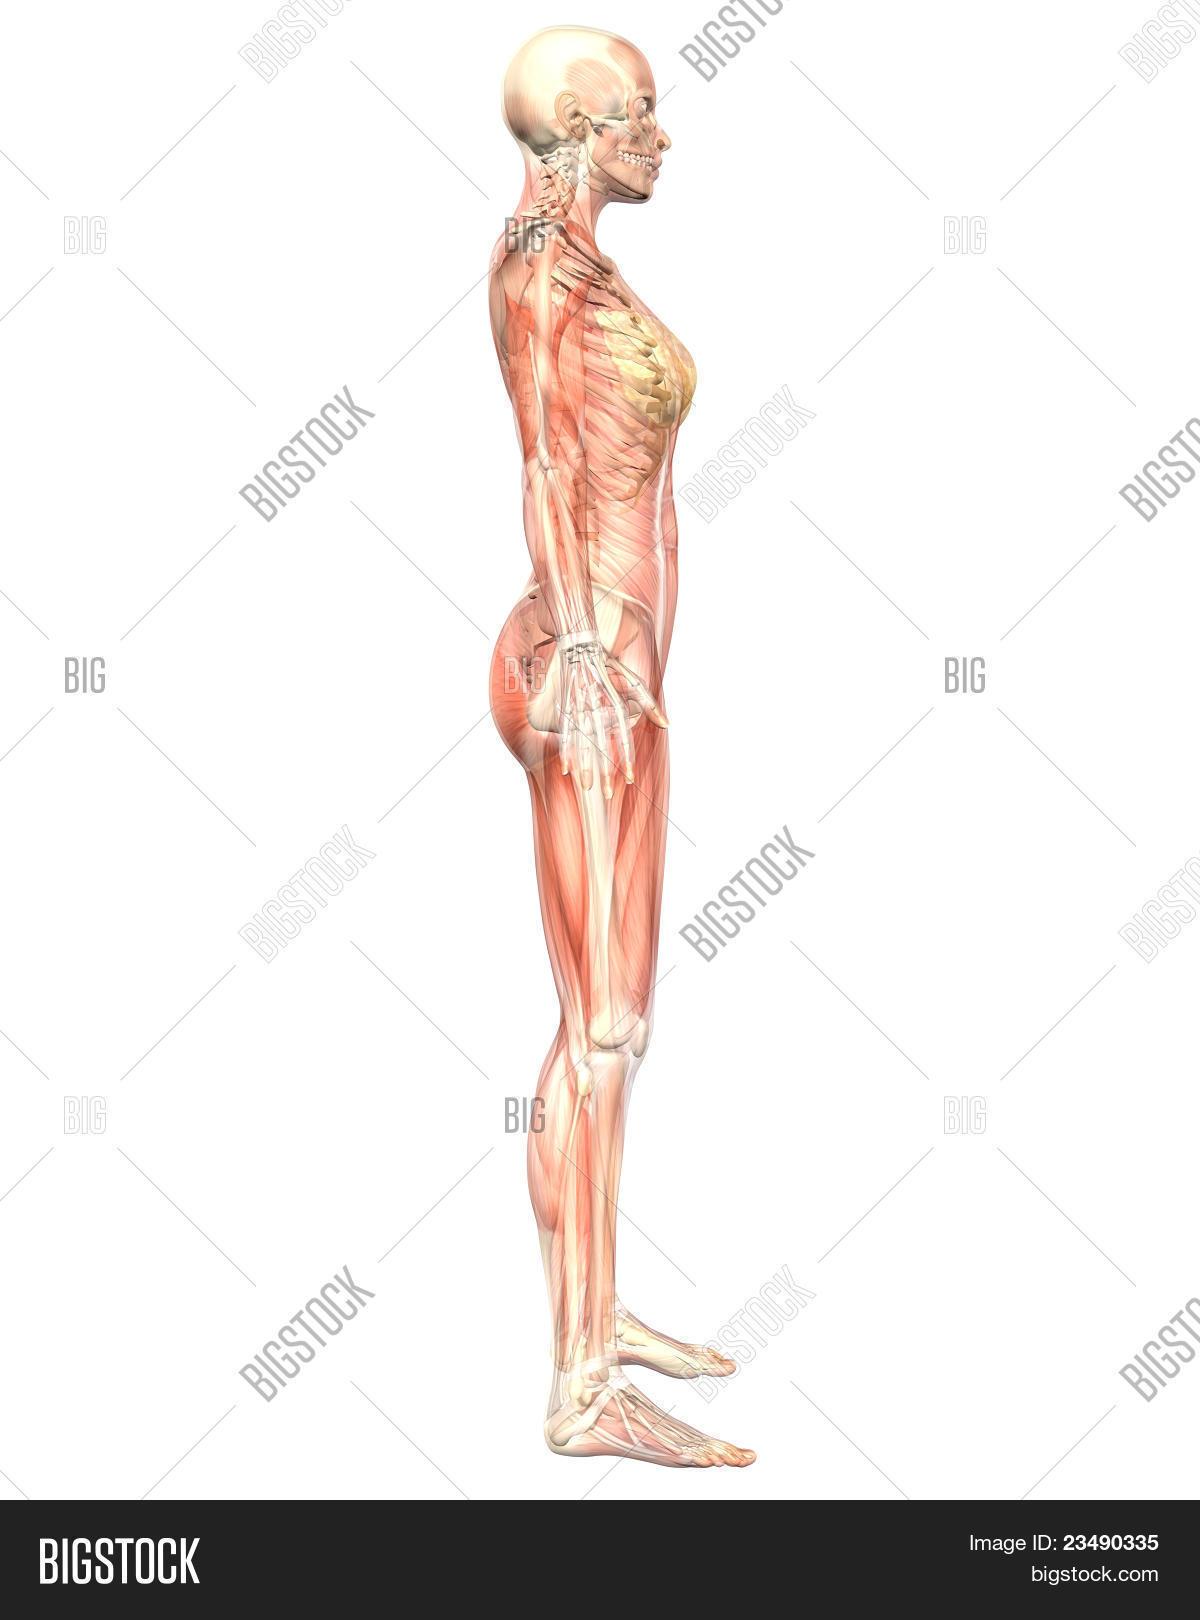 Female Muscular Image Photo Free Trial Bigstock